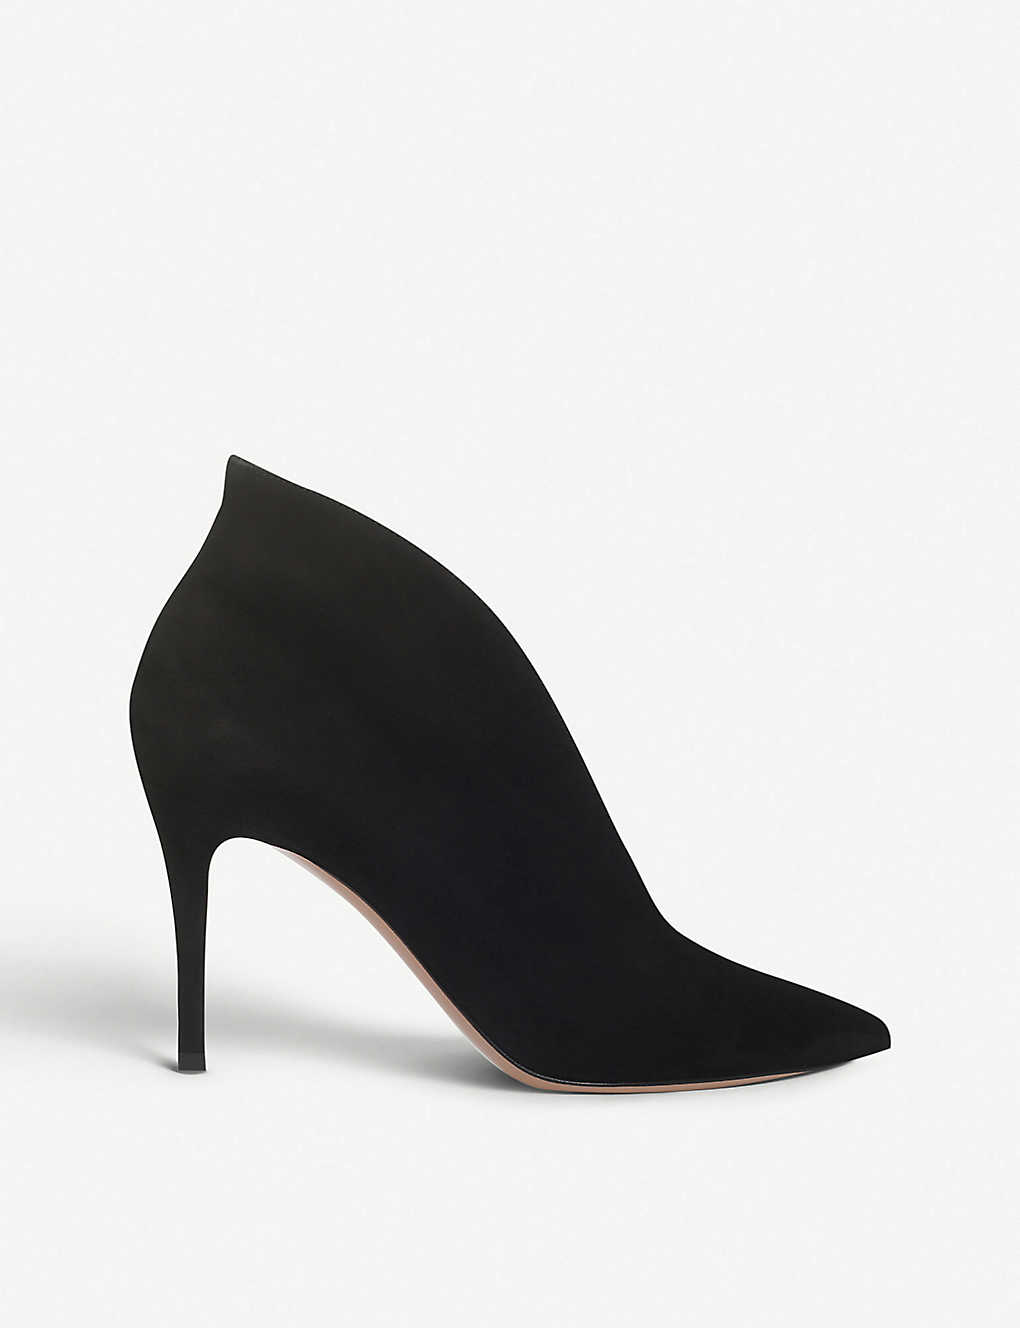 53c328619 GIANVITO ROSSI - Vania suede heeled ankle boots | Selfridges.com